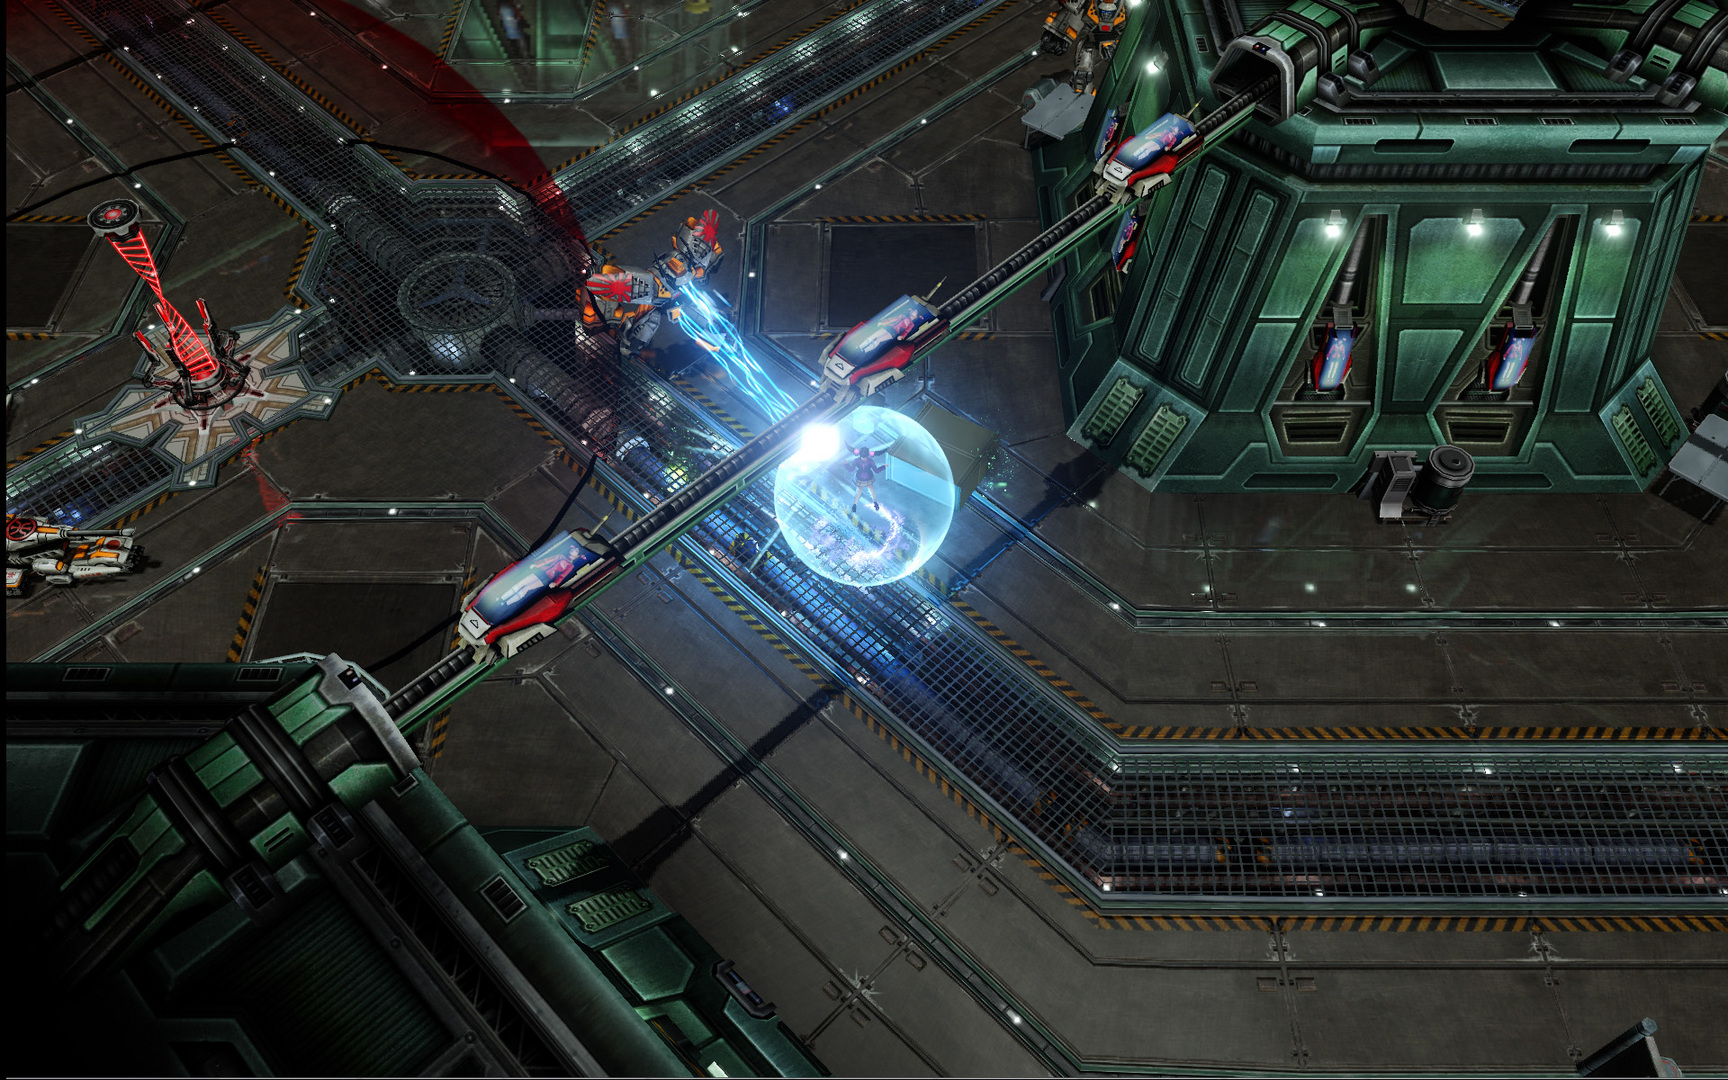 Command & Conquer: Red Alert 3 - Uprising Fiyat Karşılaştırma